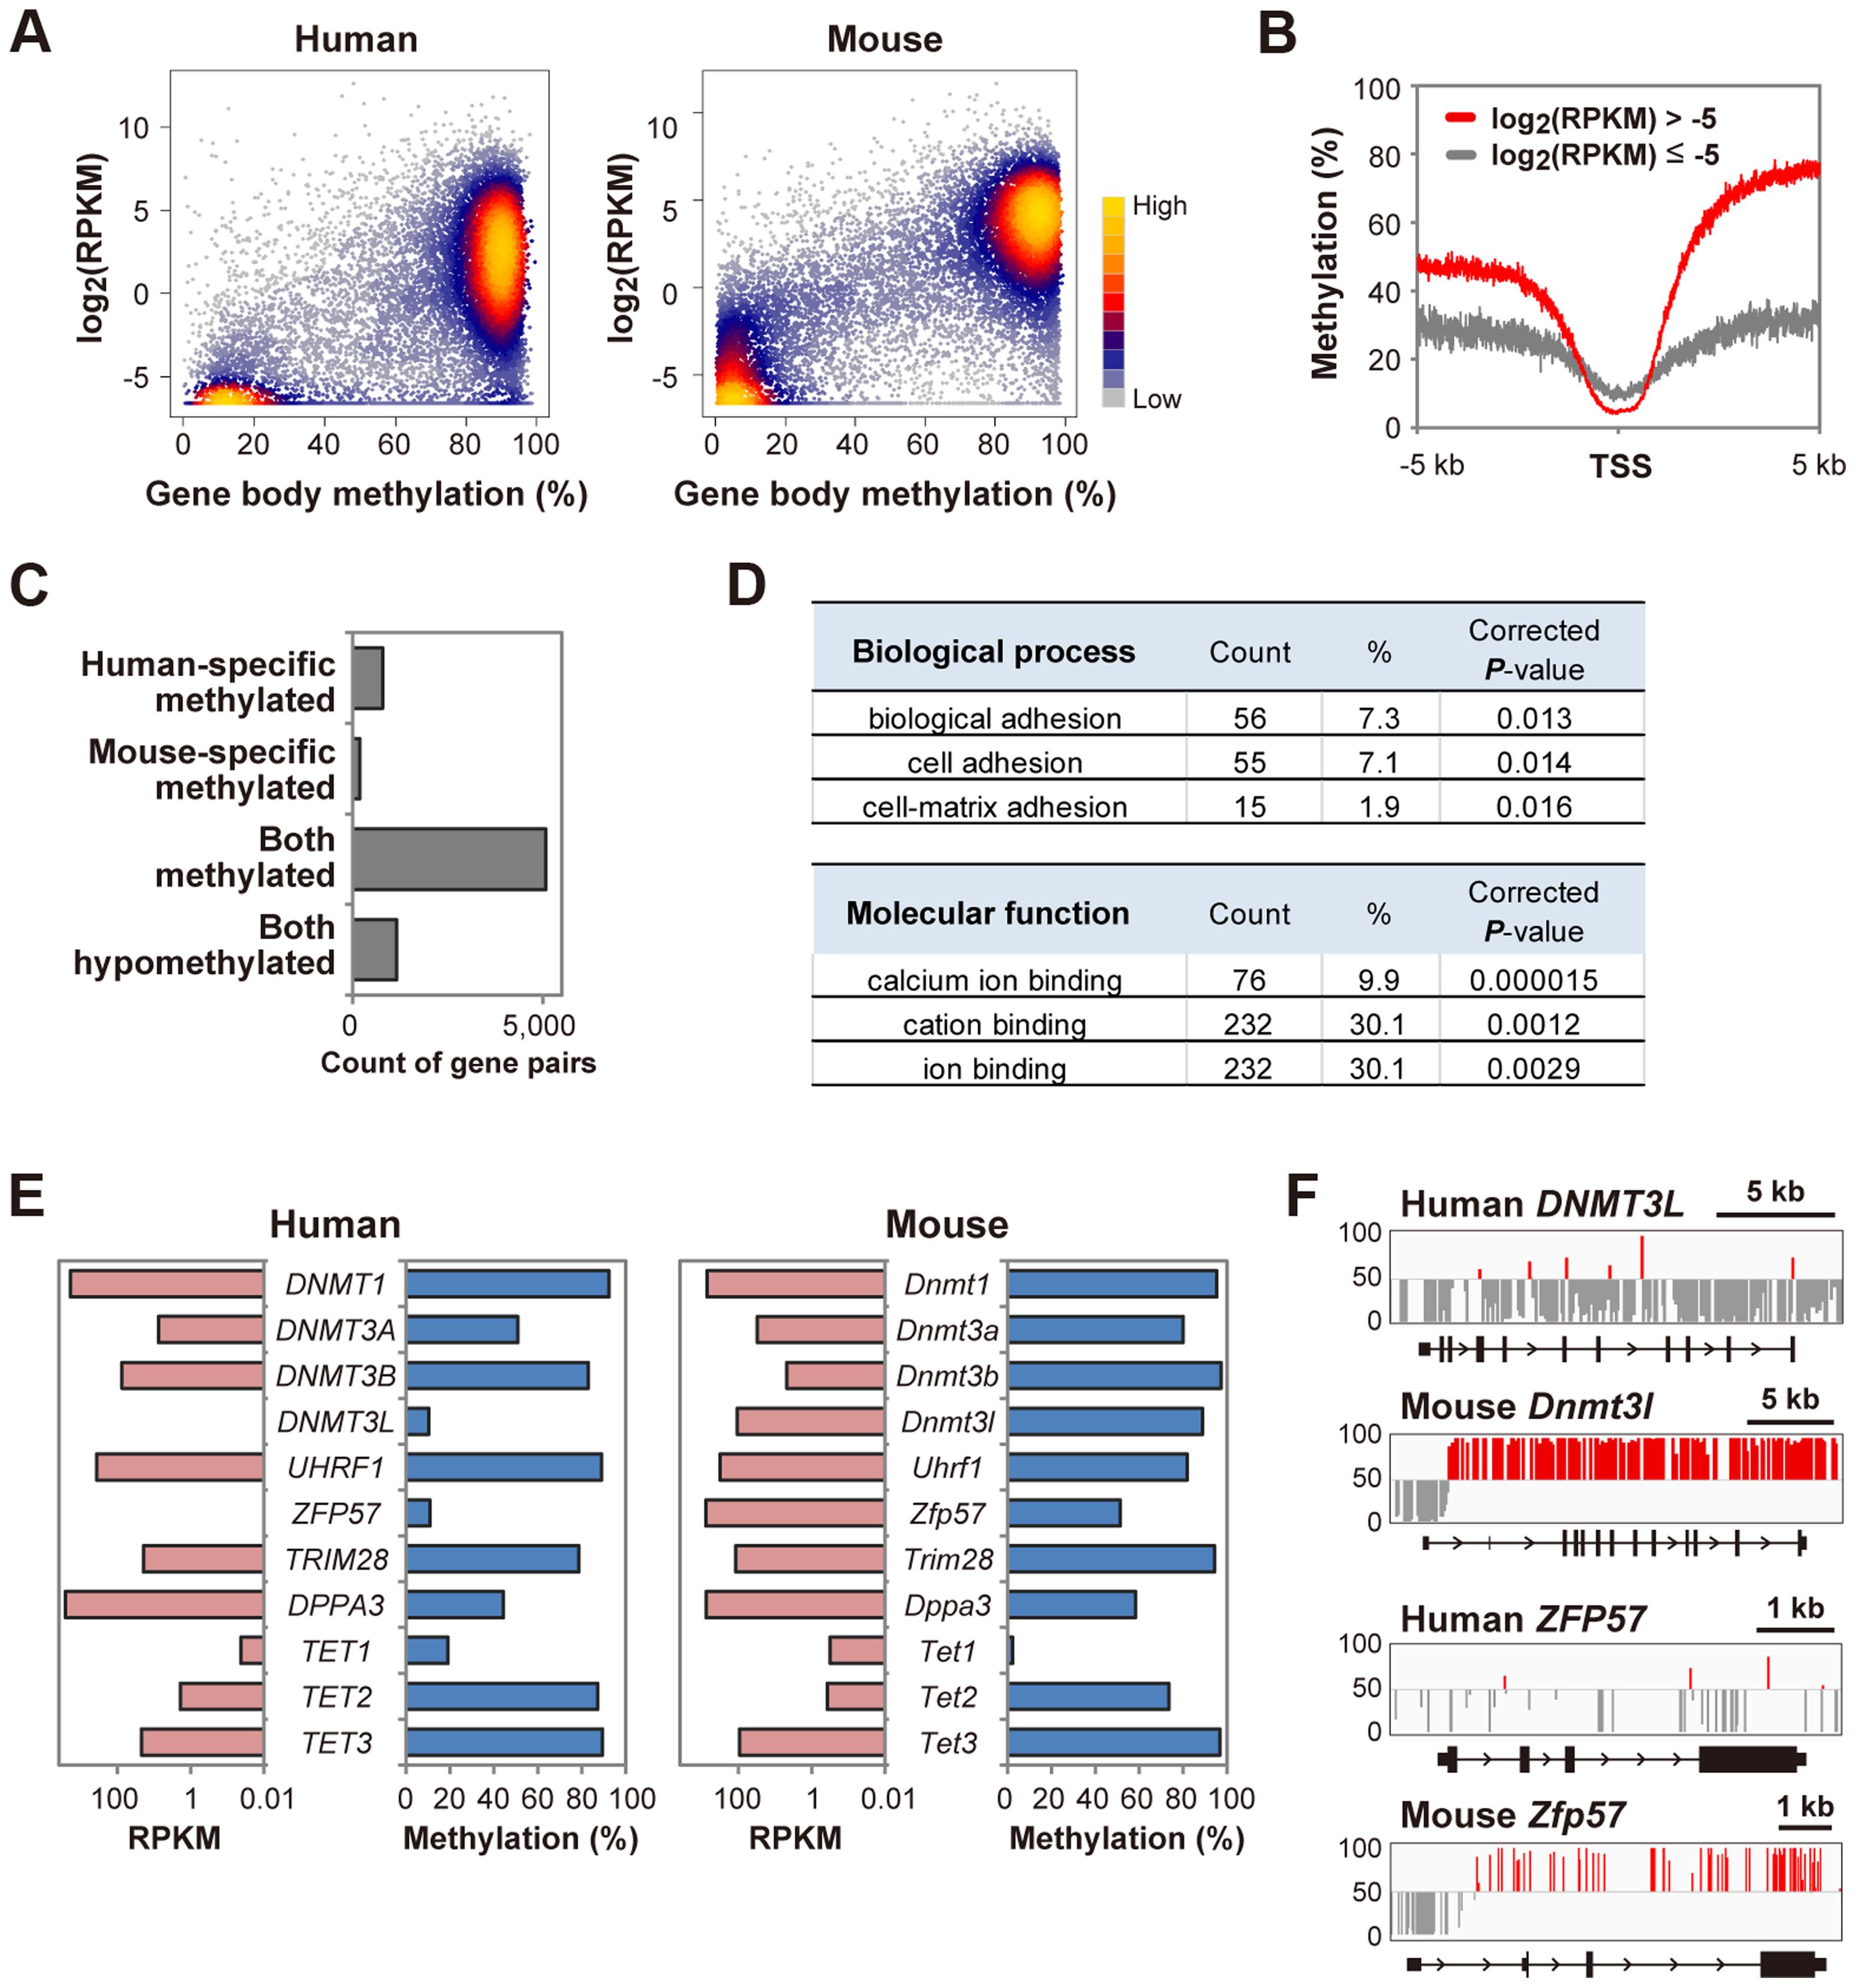 A bimodal gene body methylation pattern associated with transcription in human oocytes.